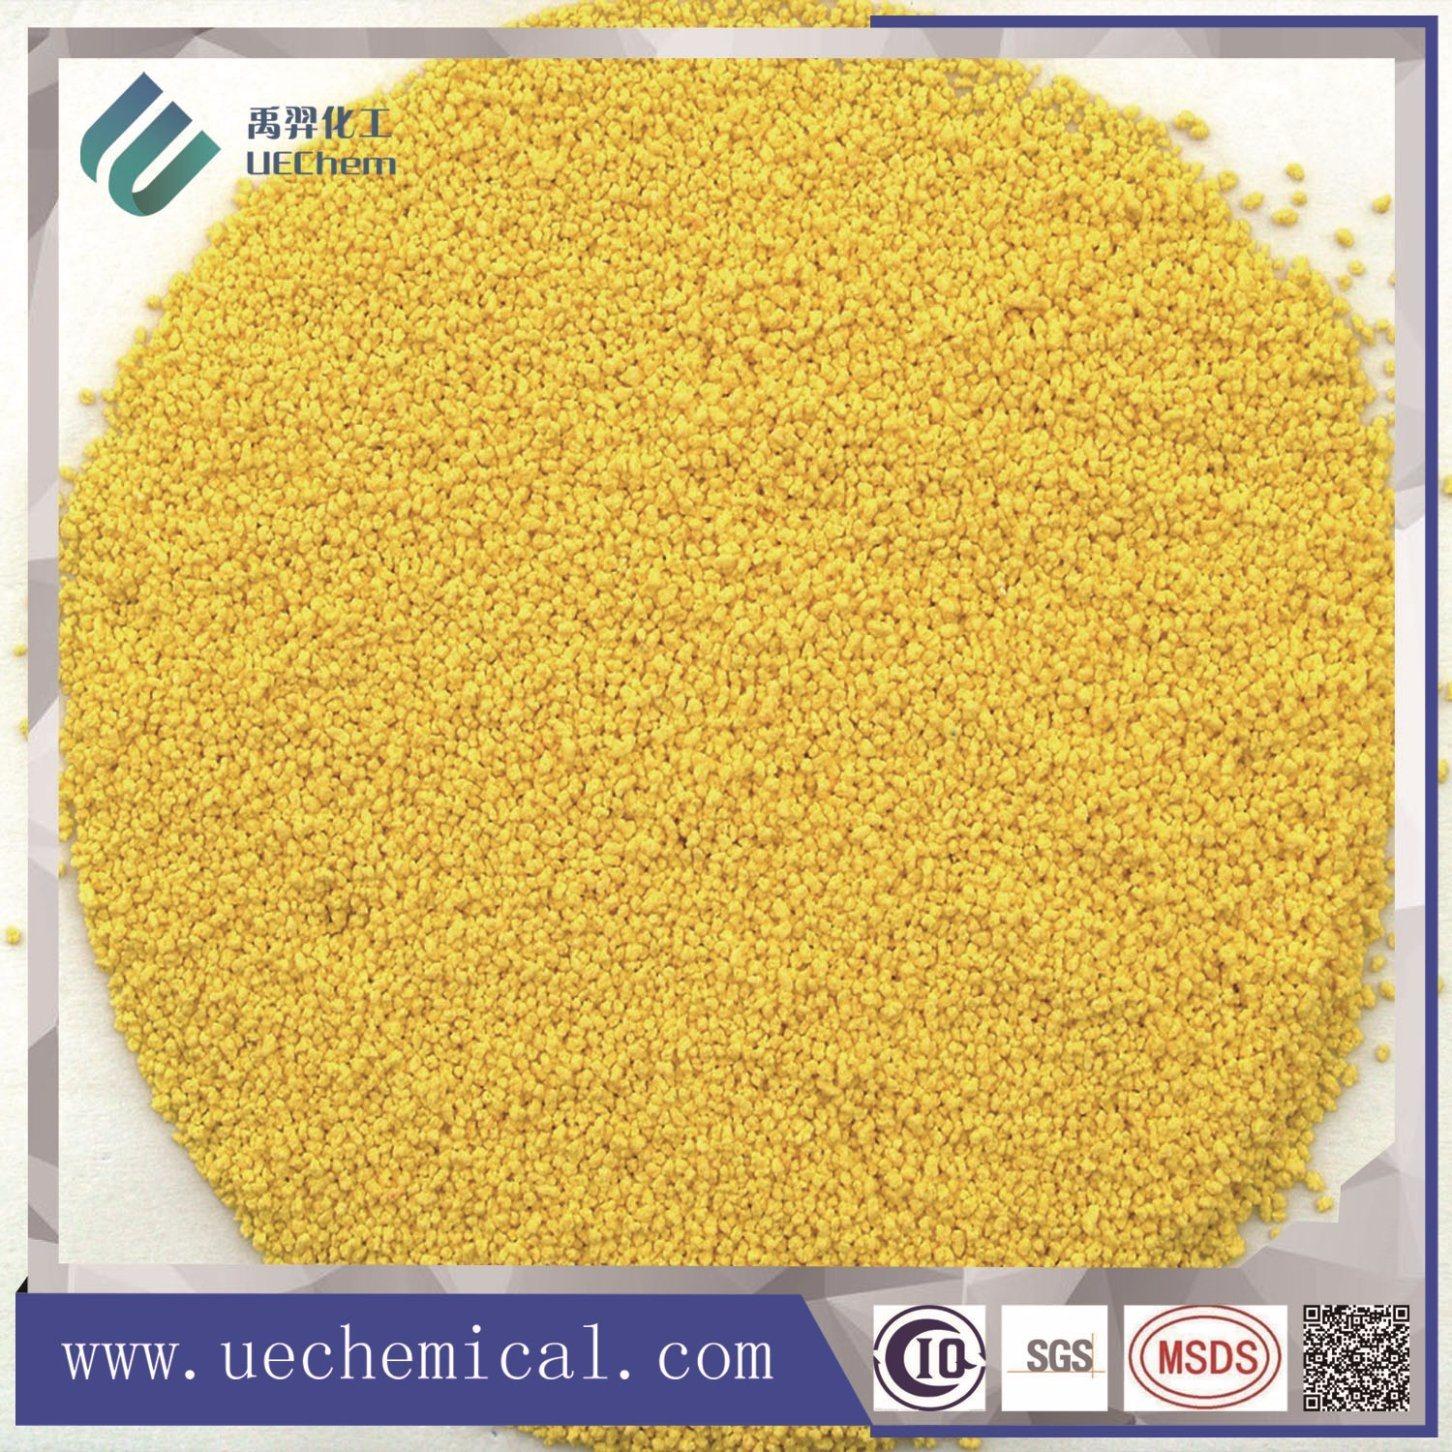 Yellow Speckles for Detergent Powder